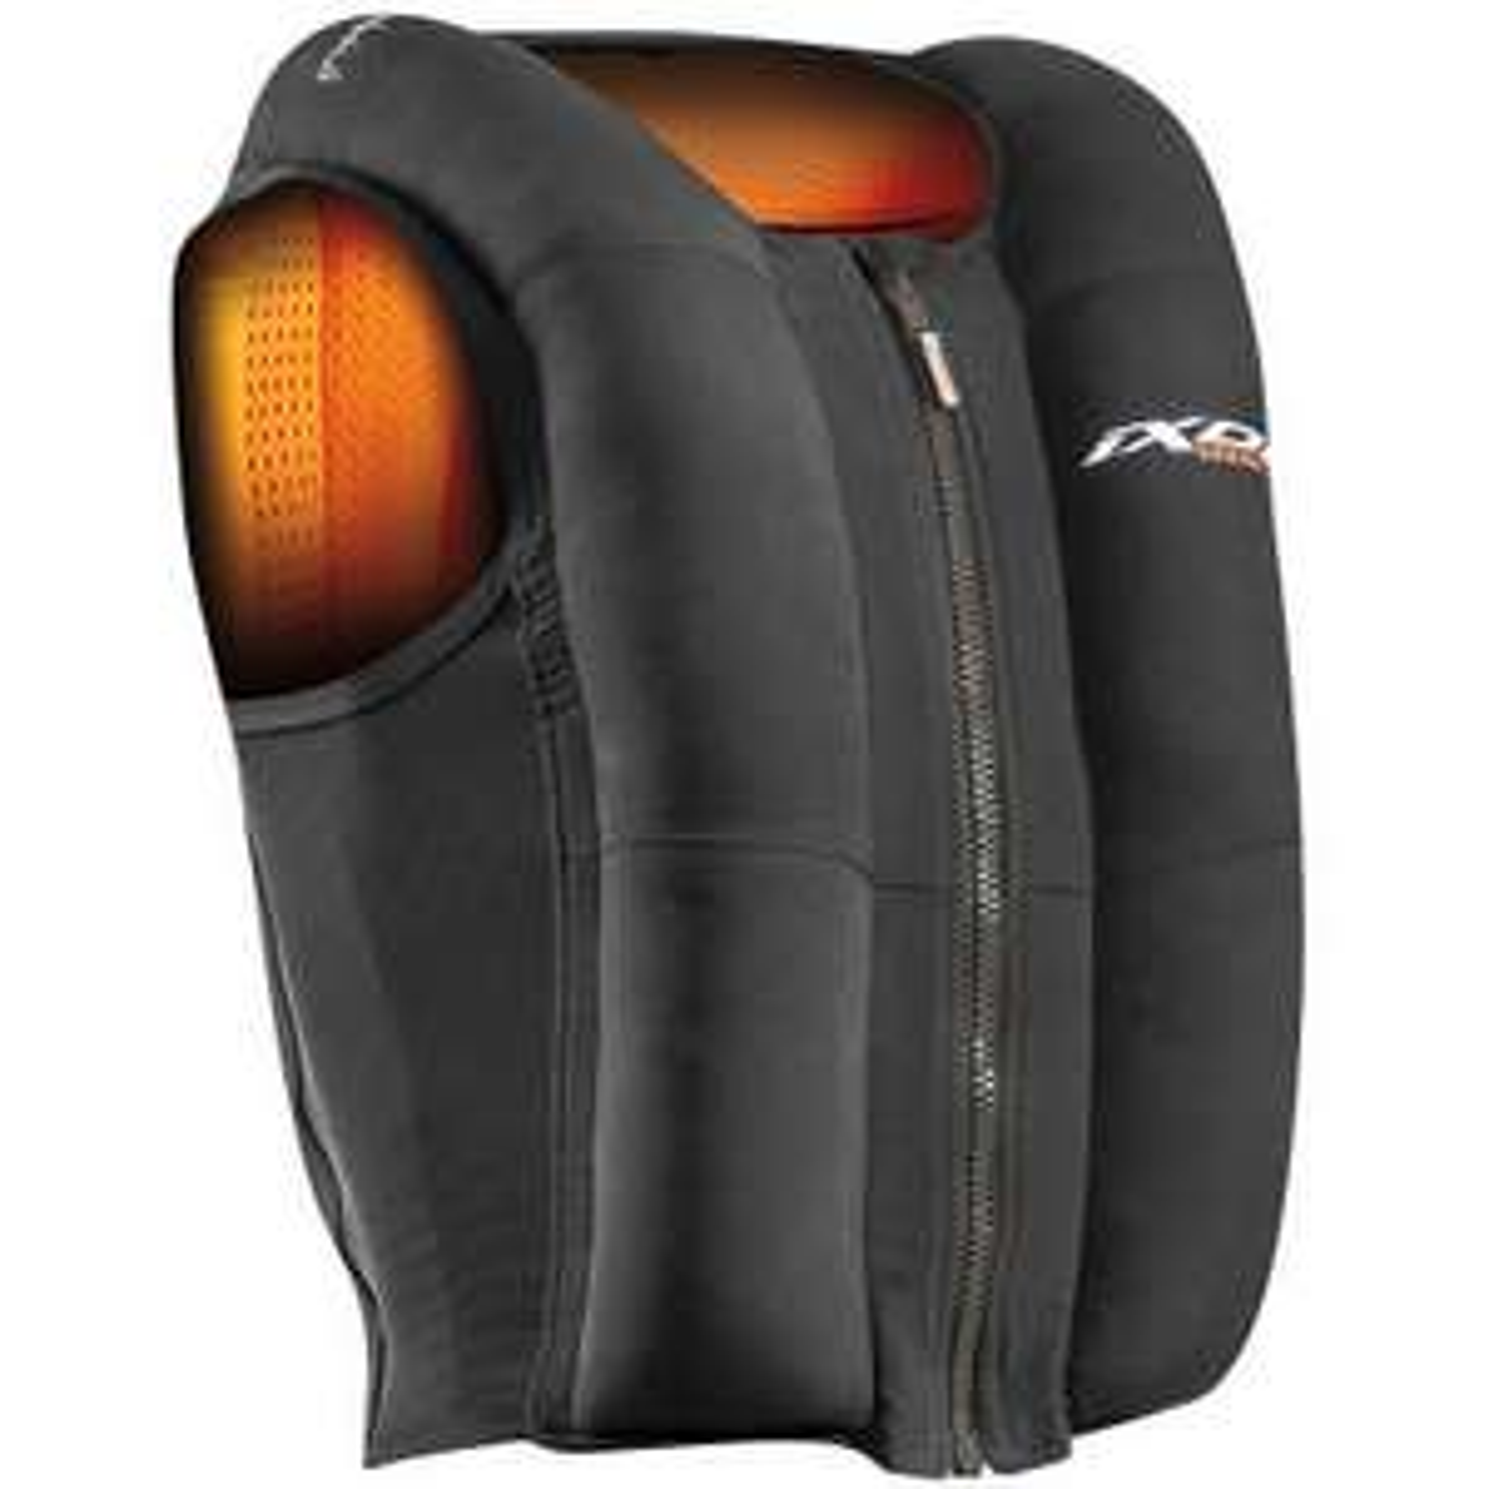 Gilet Airbag Ixon IX-Airbag U03 (Tailles au choix)